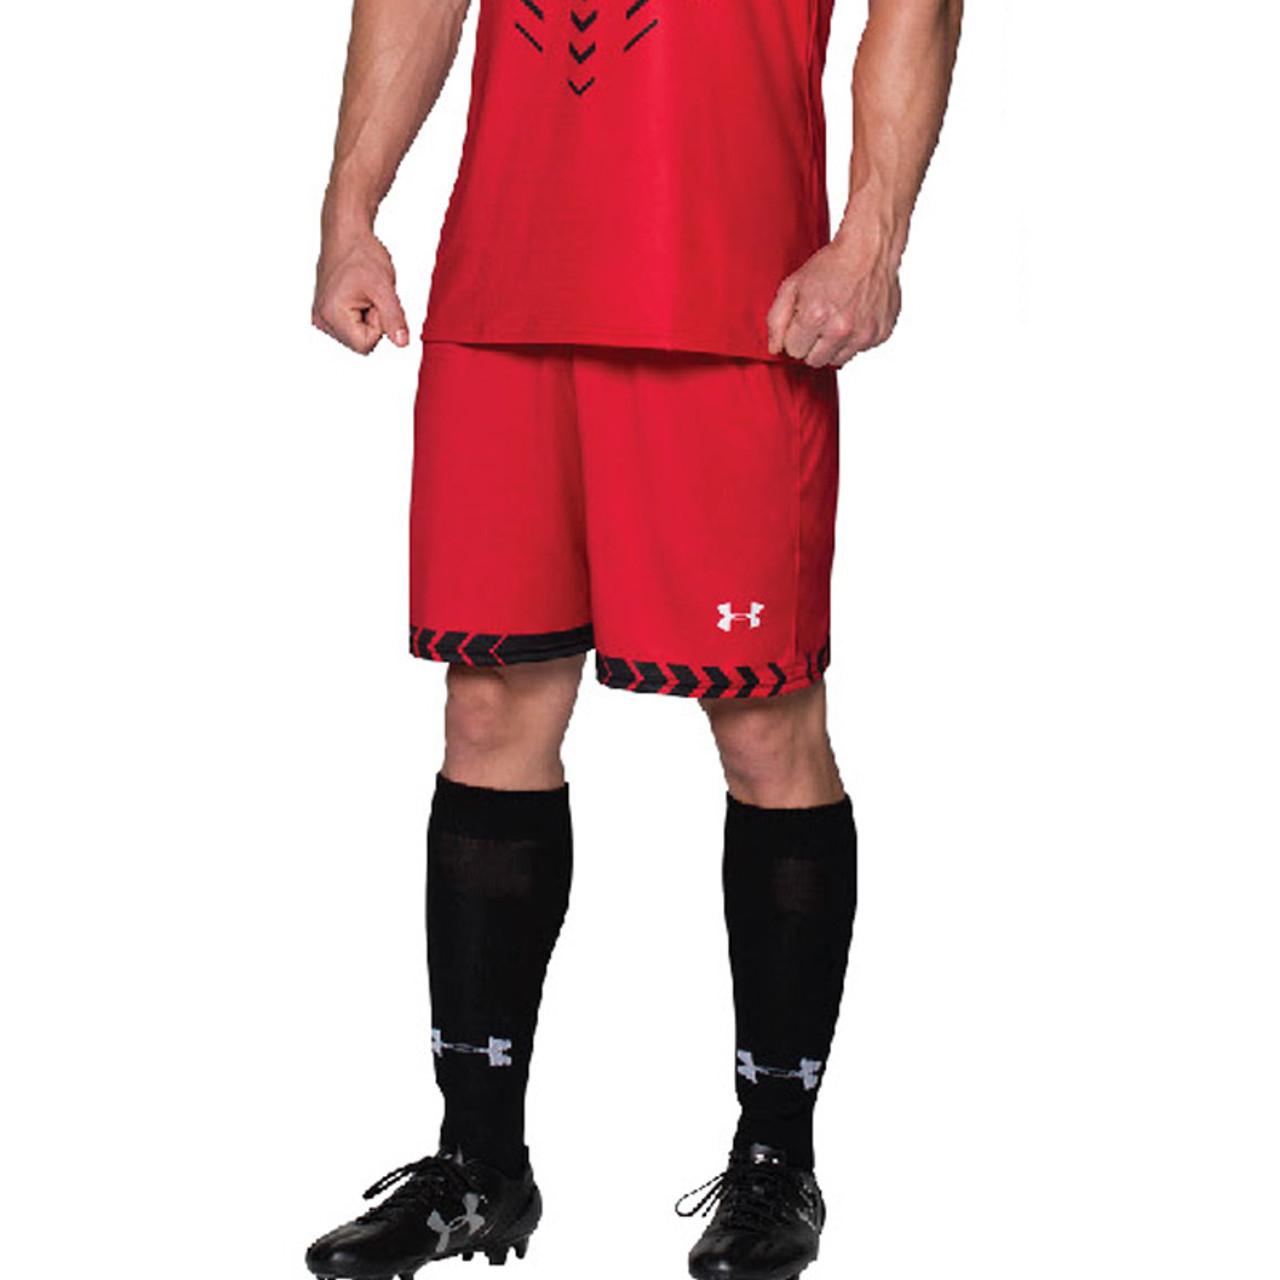 ae59282503 Under Armour Men's Armourfuse Soccer Short - Calcio